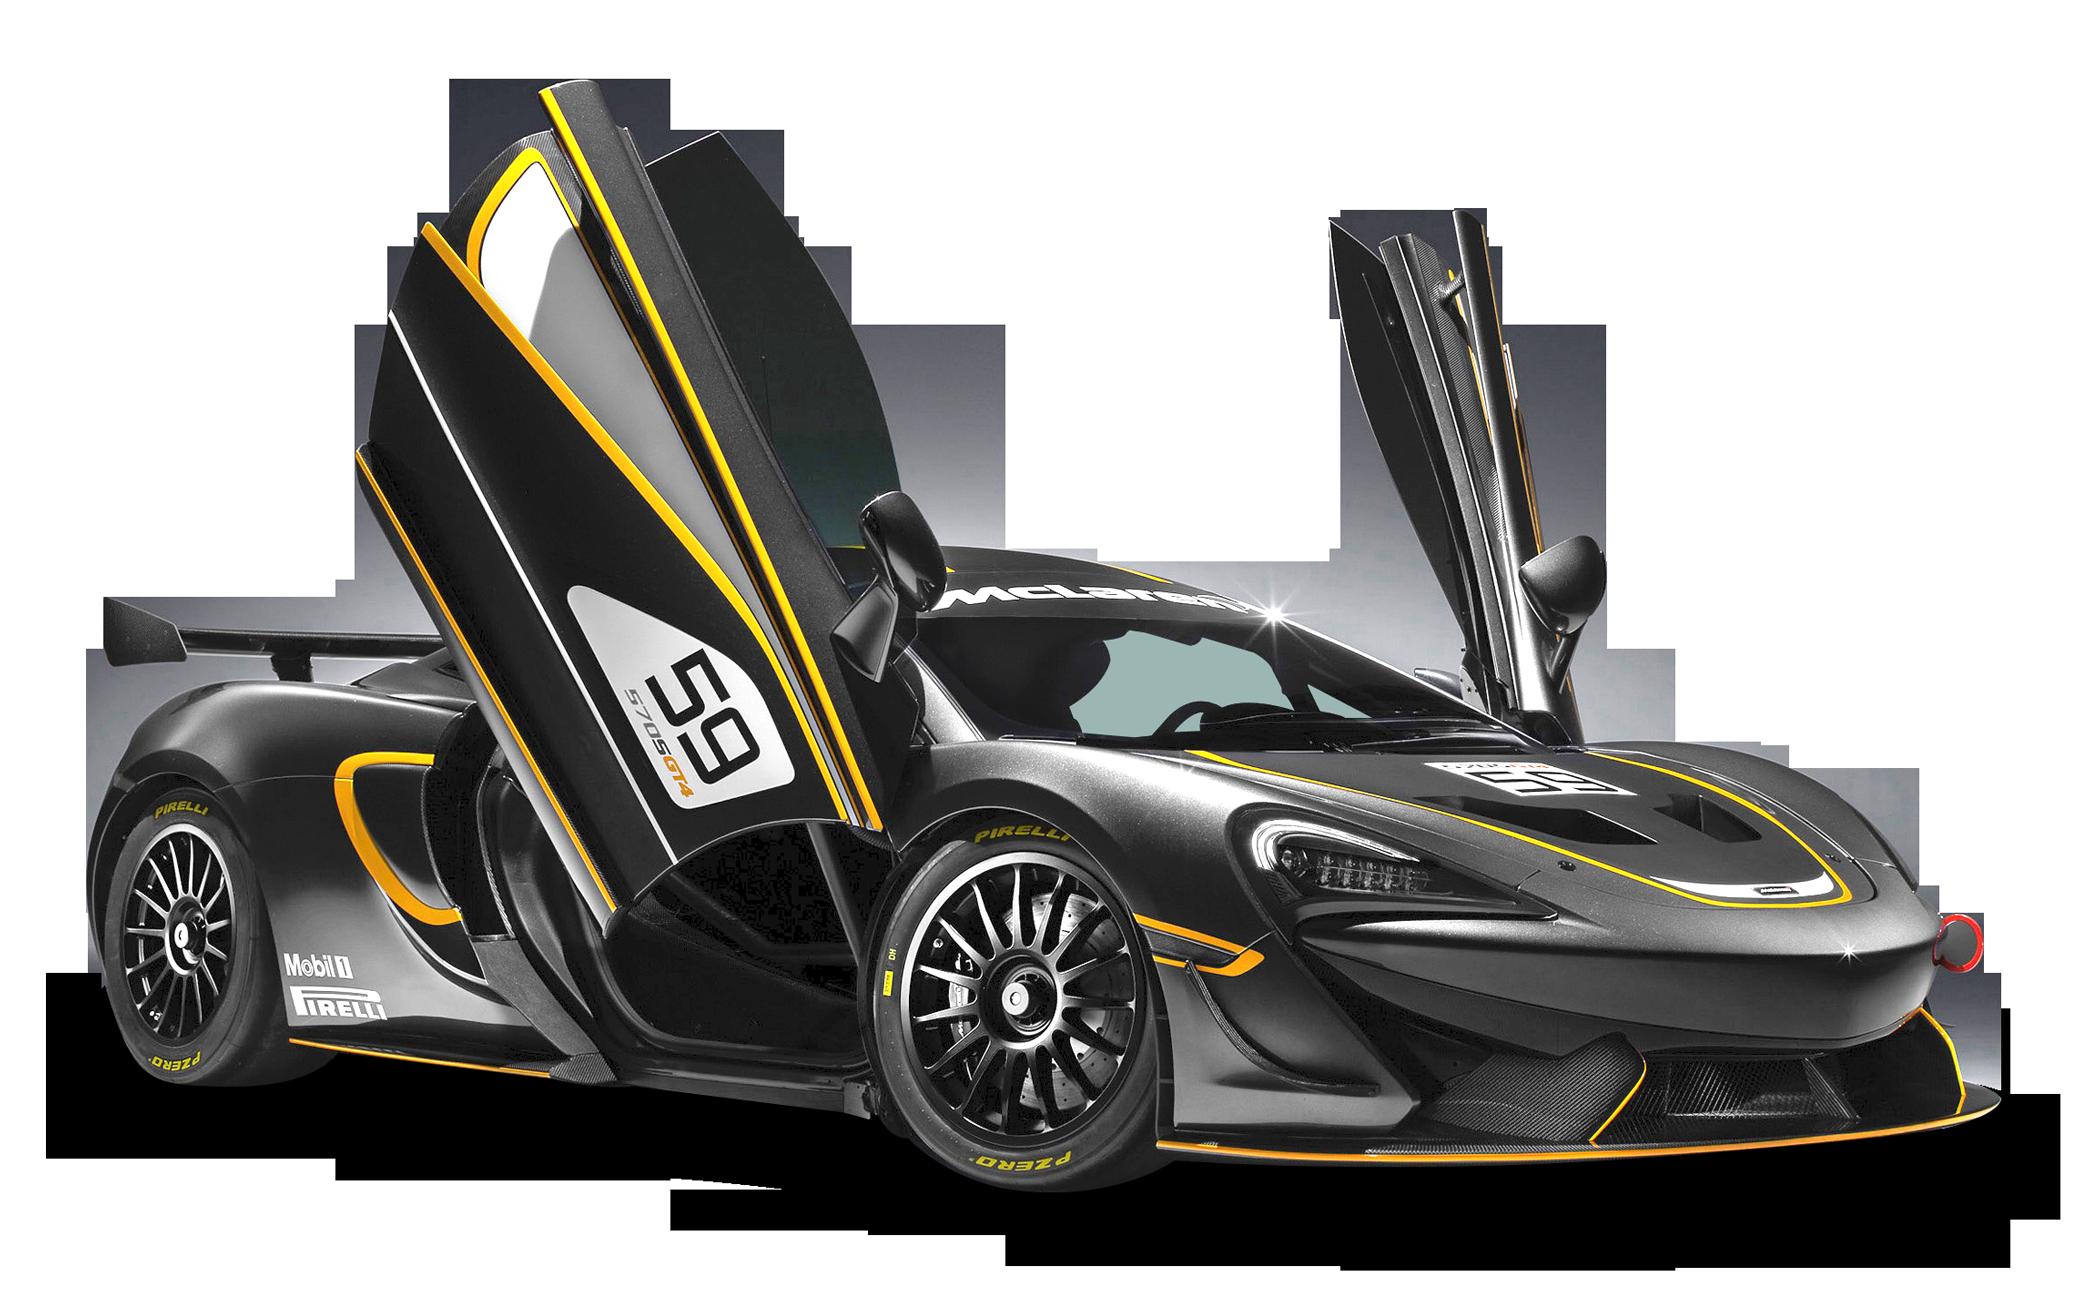 Black McLaren 570S GT4 Sports Car PNG Image